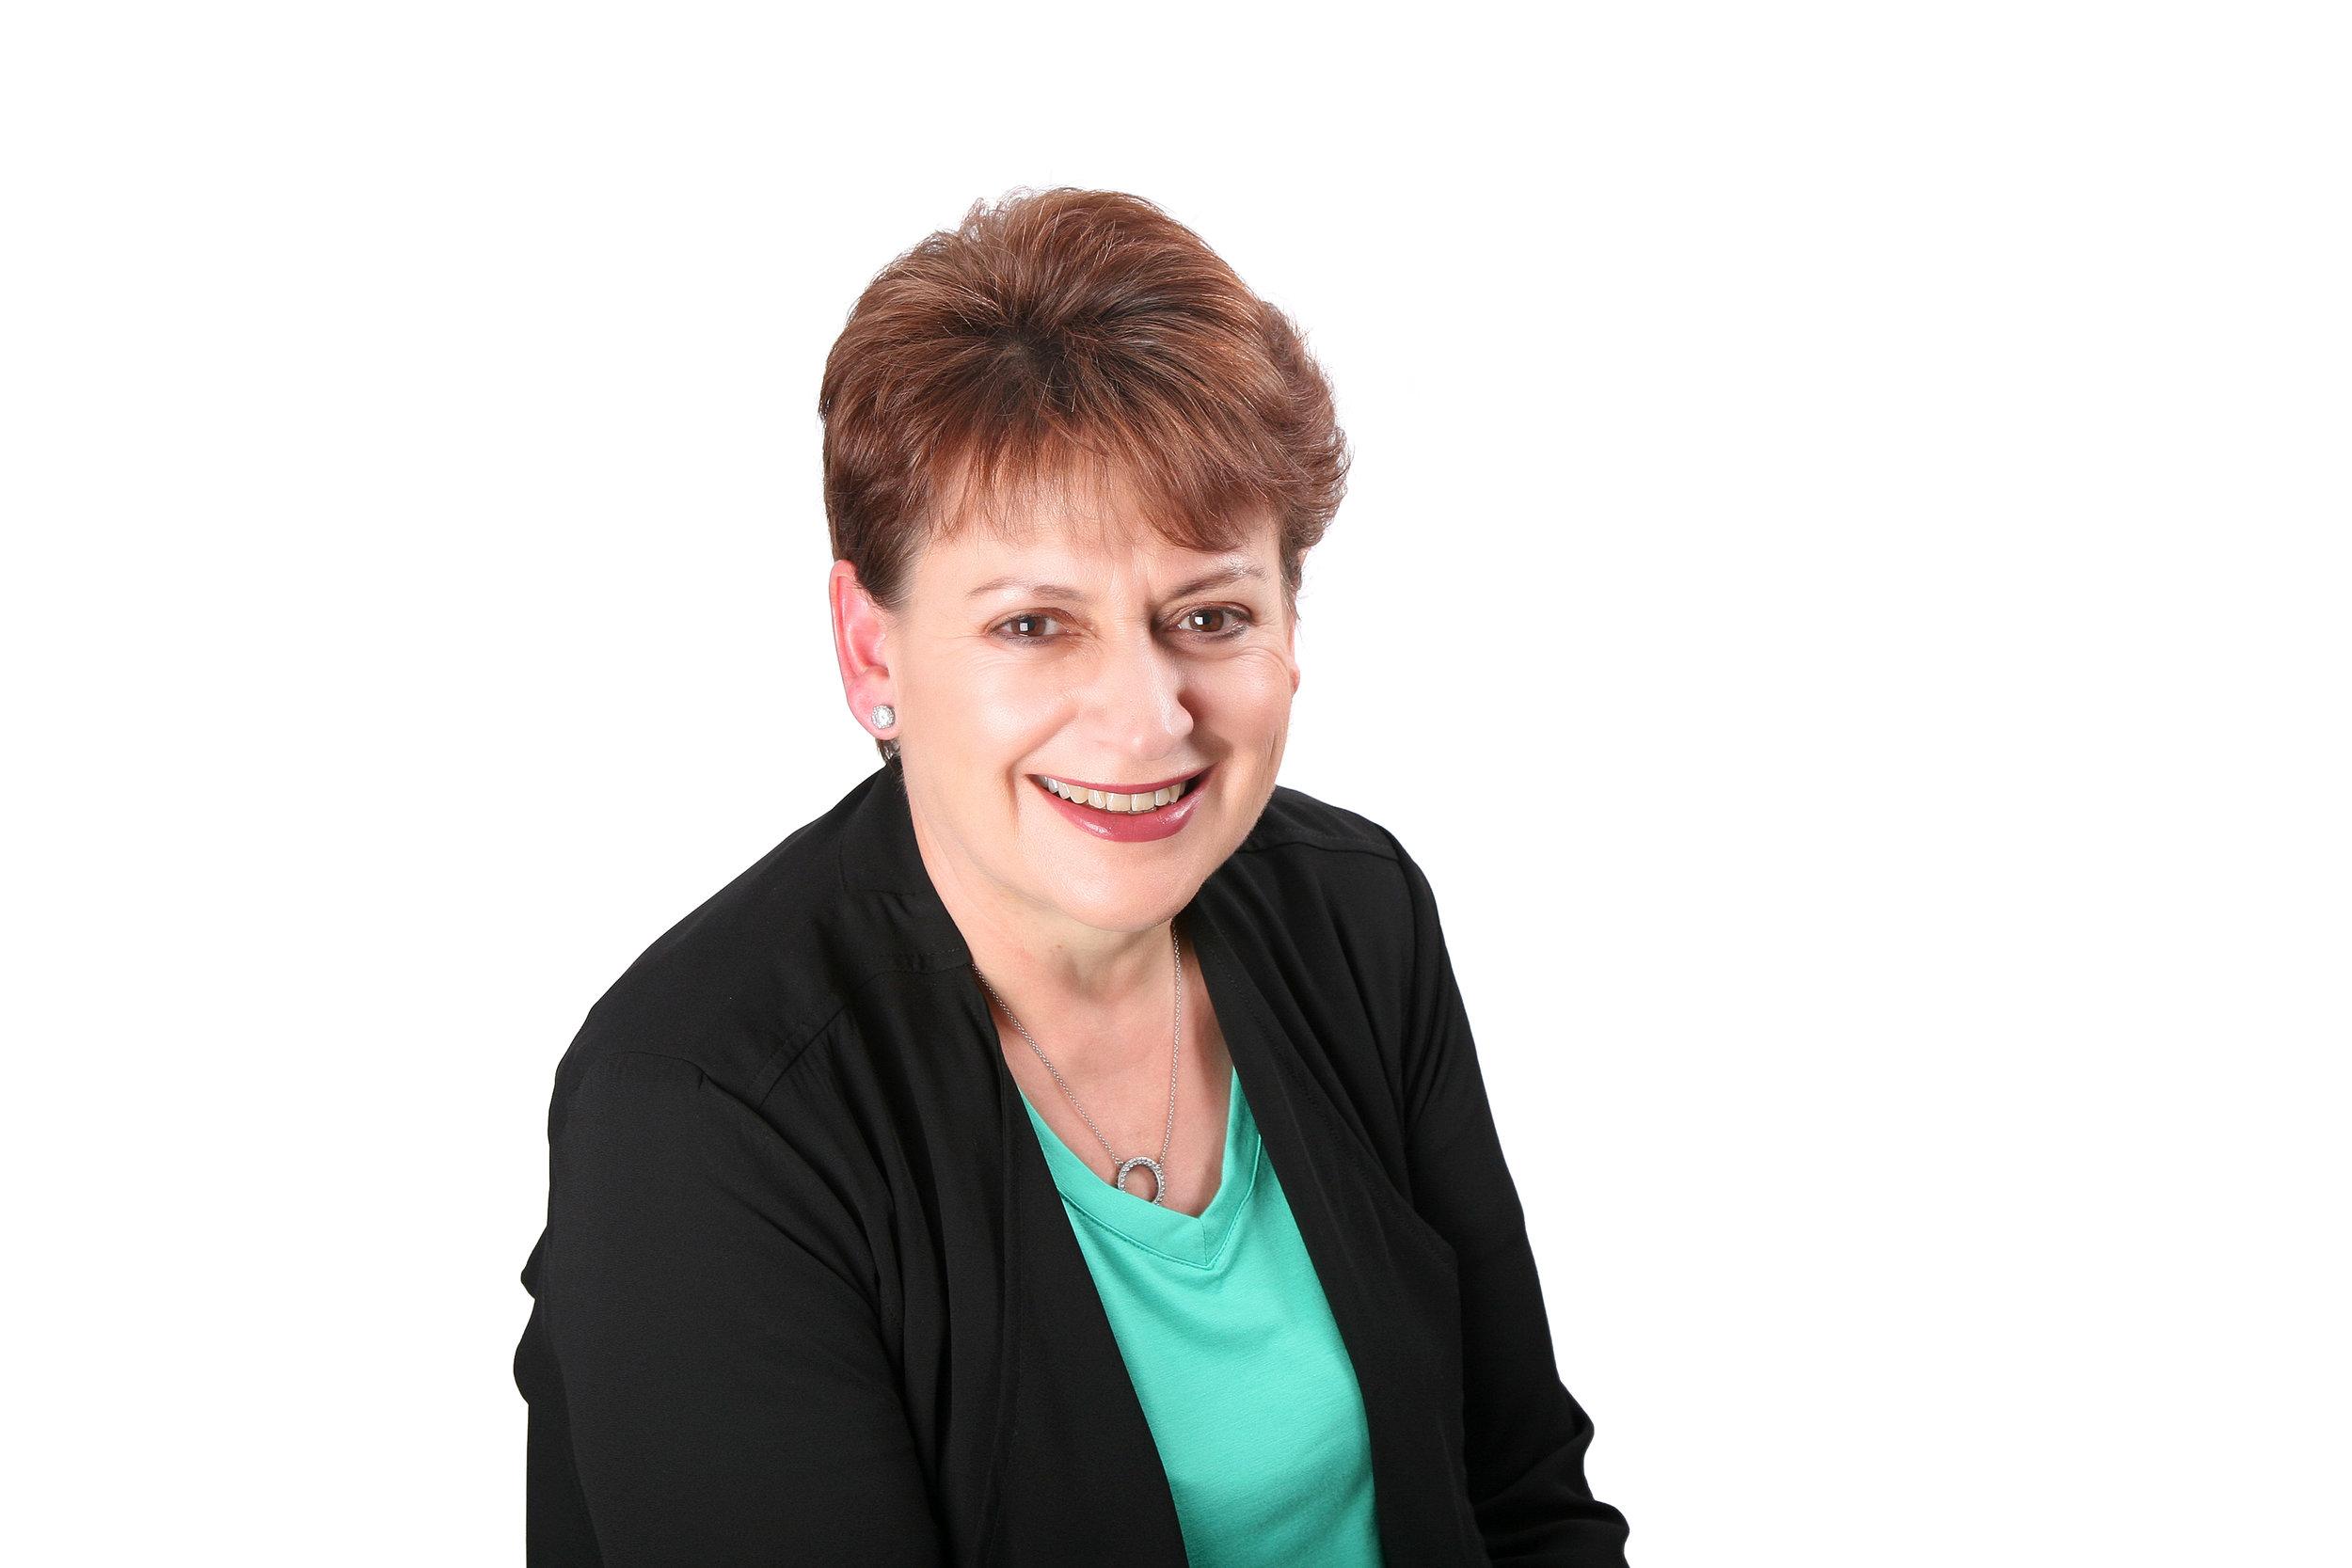 Teresa Brandau Stranks, of Career Wellness